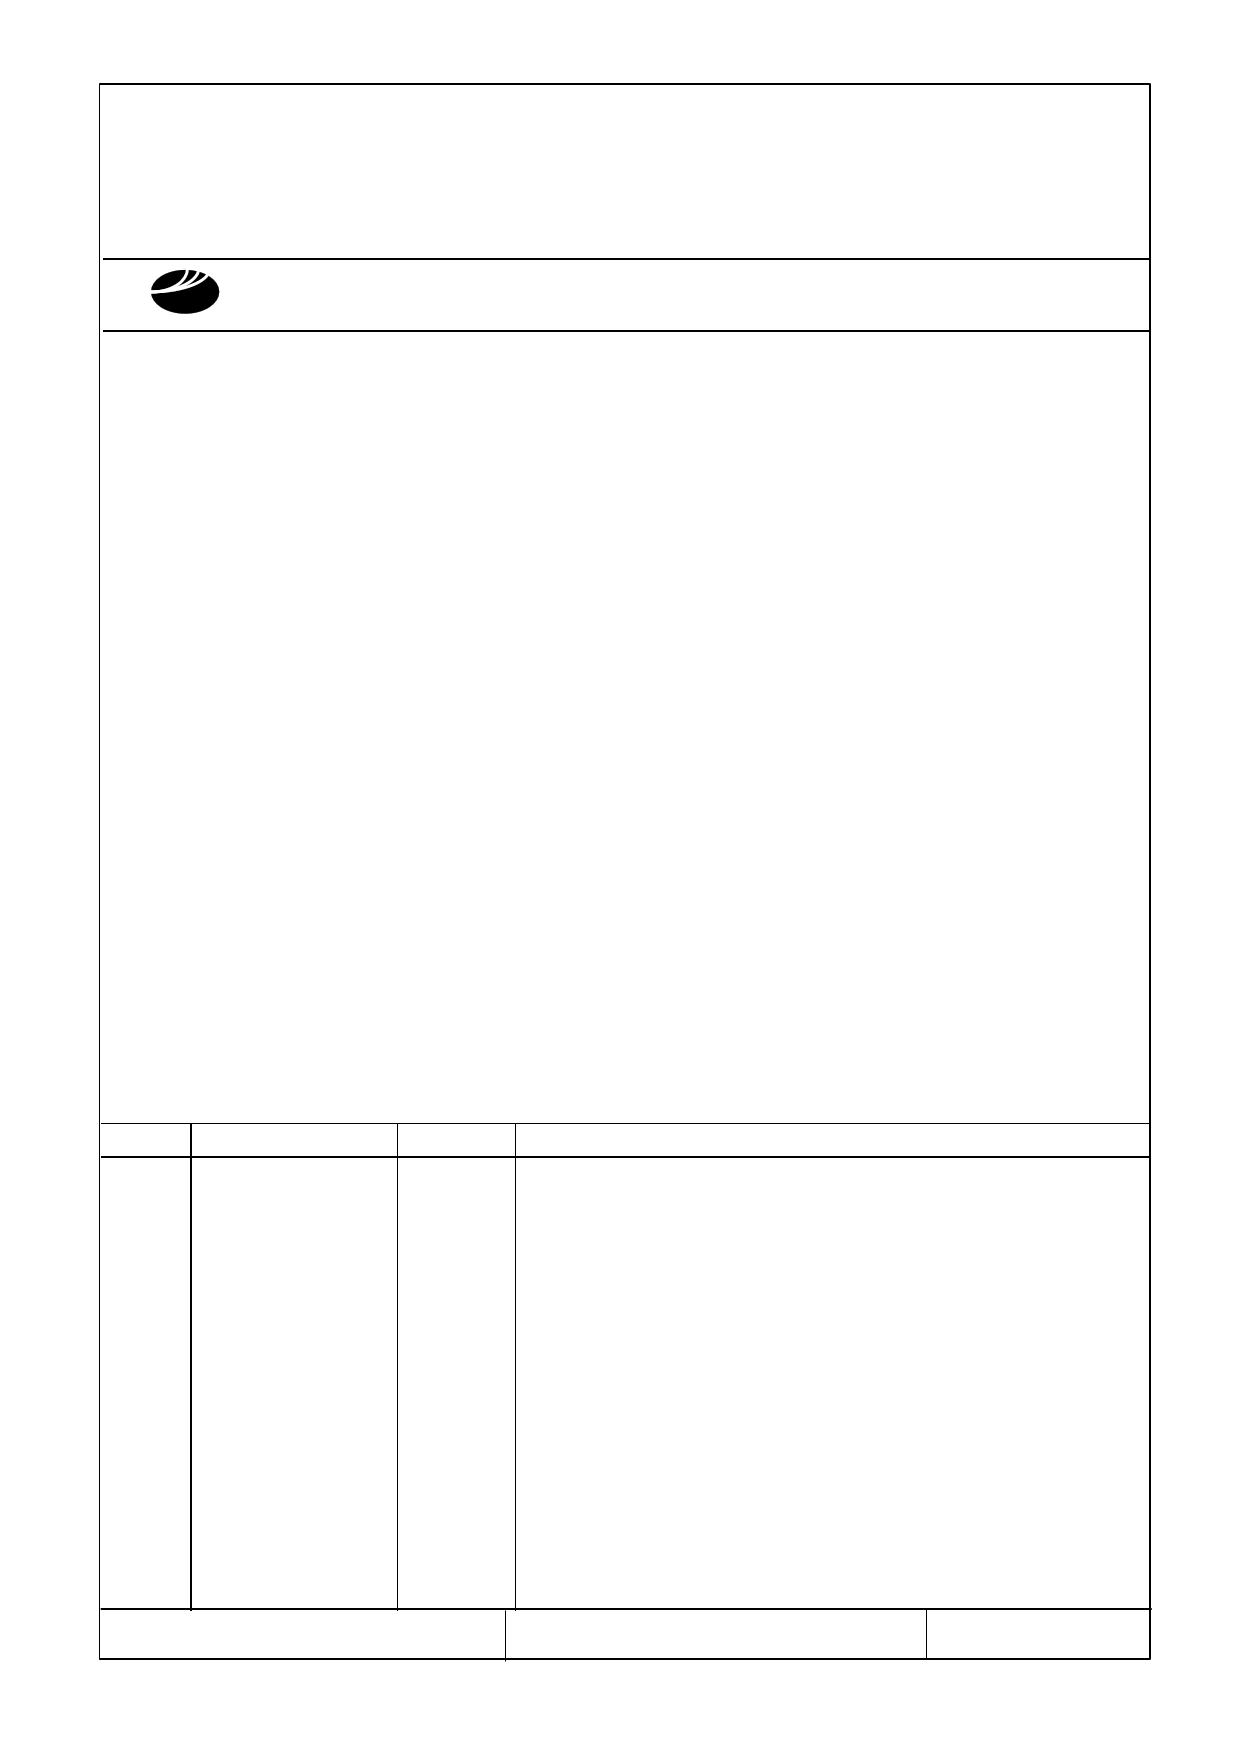 T-51513D104U-FW-A-AB دیتاشیت PDF